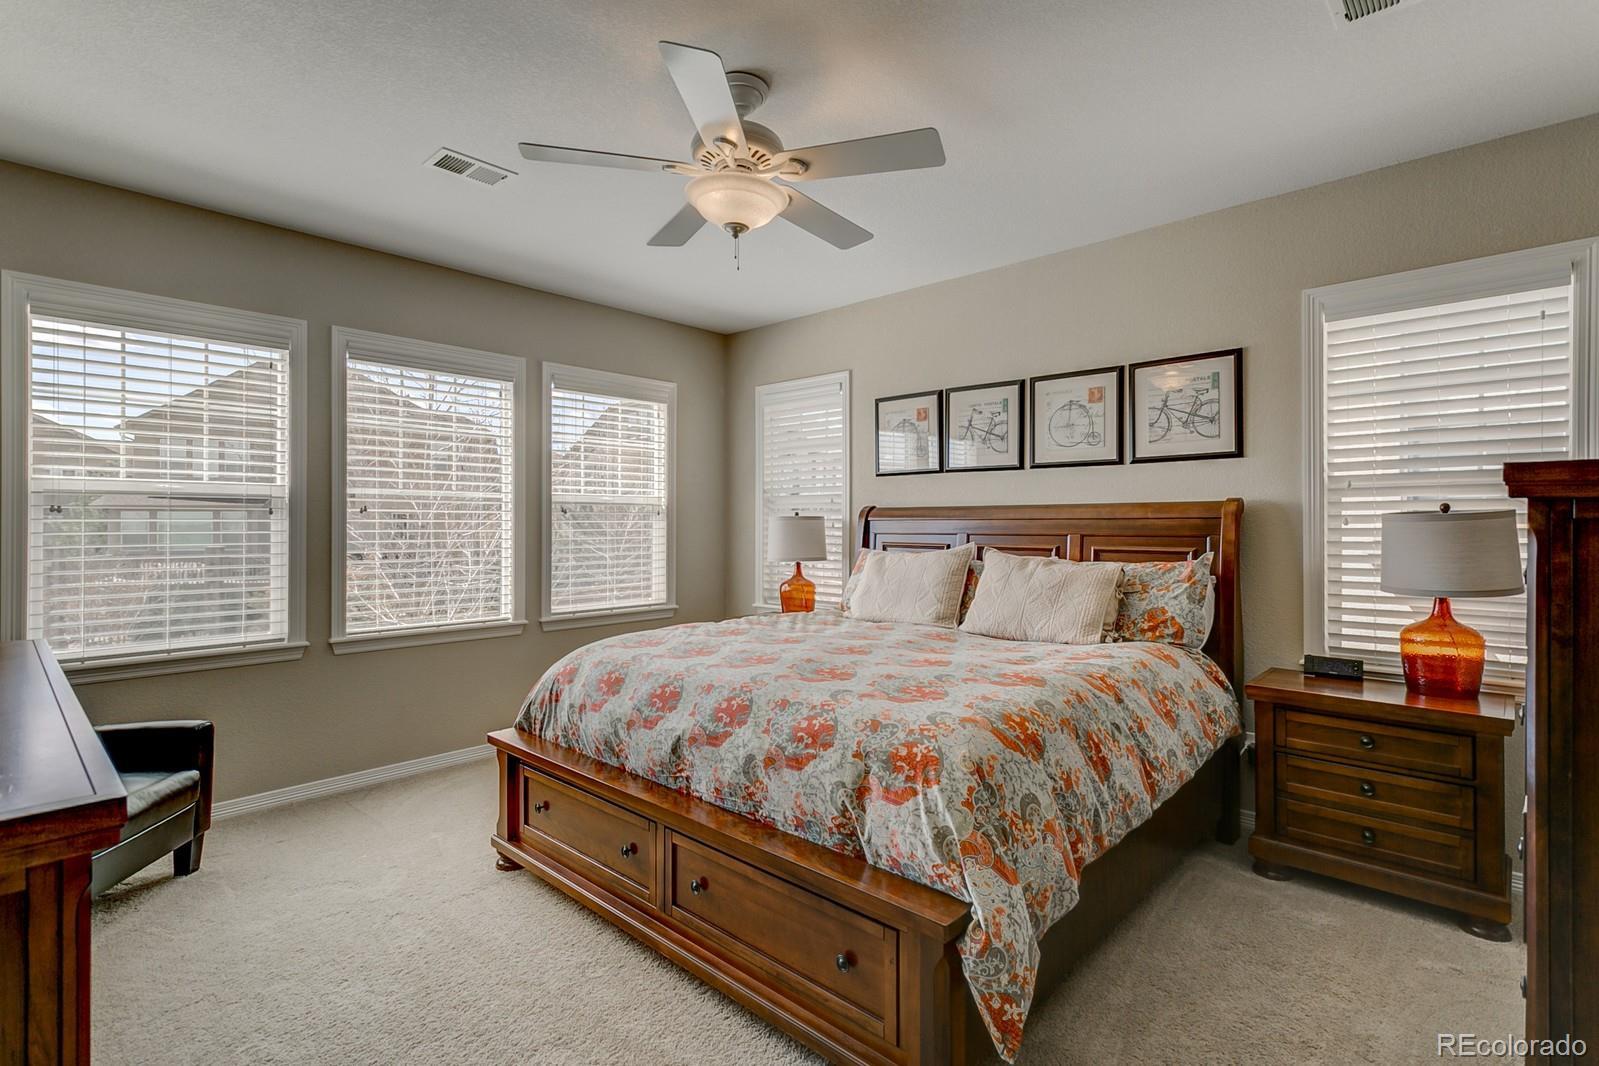 MLS# 6747511 - 14 - 4568 Valleybrook Drive, Highlands Ranch, CO 80130